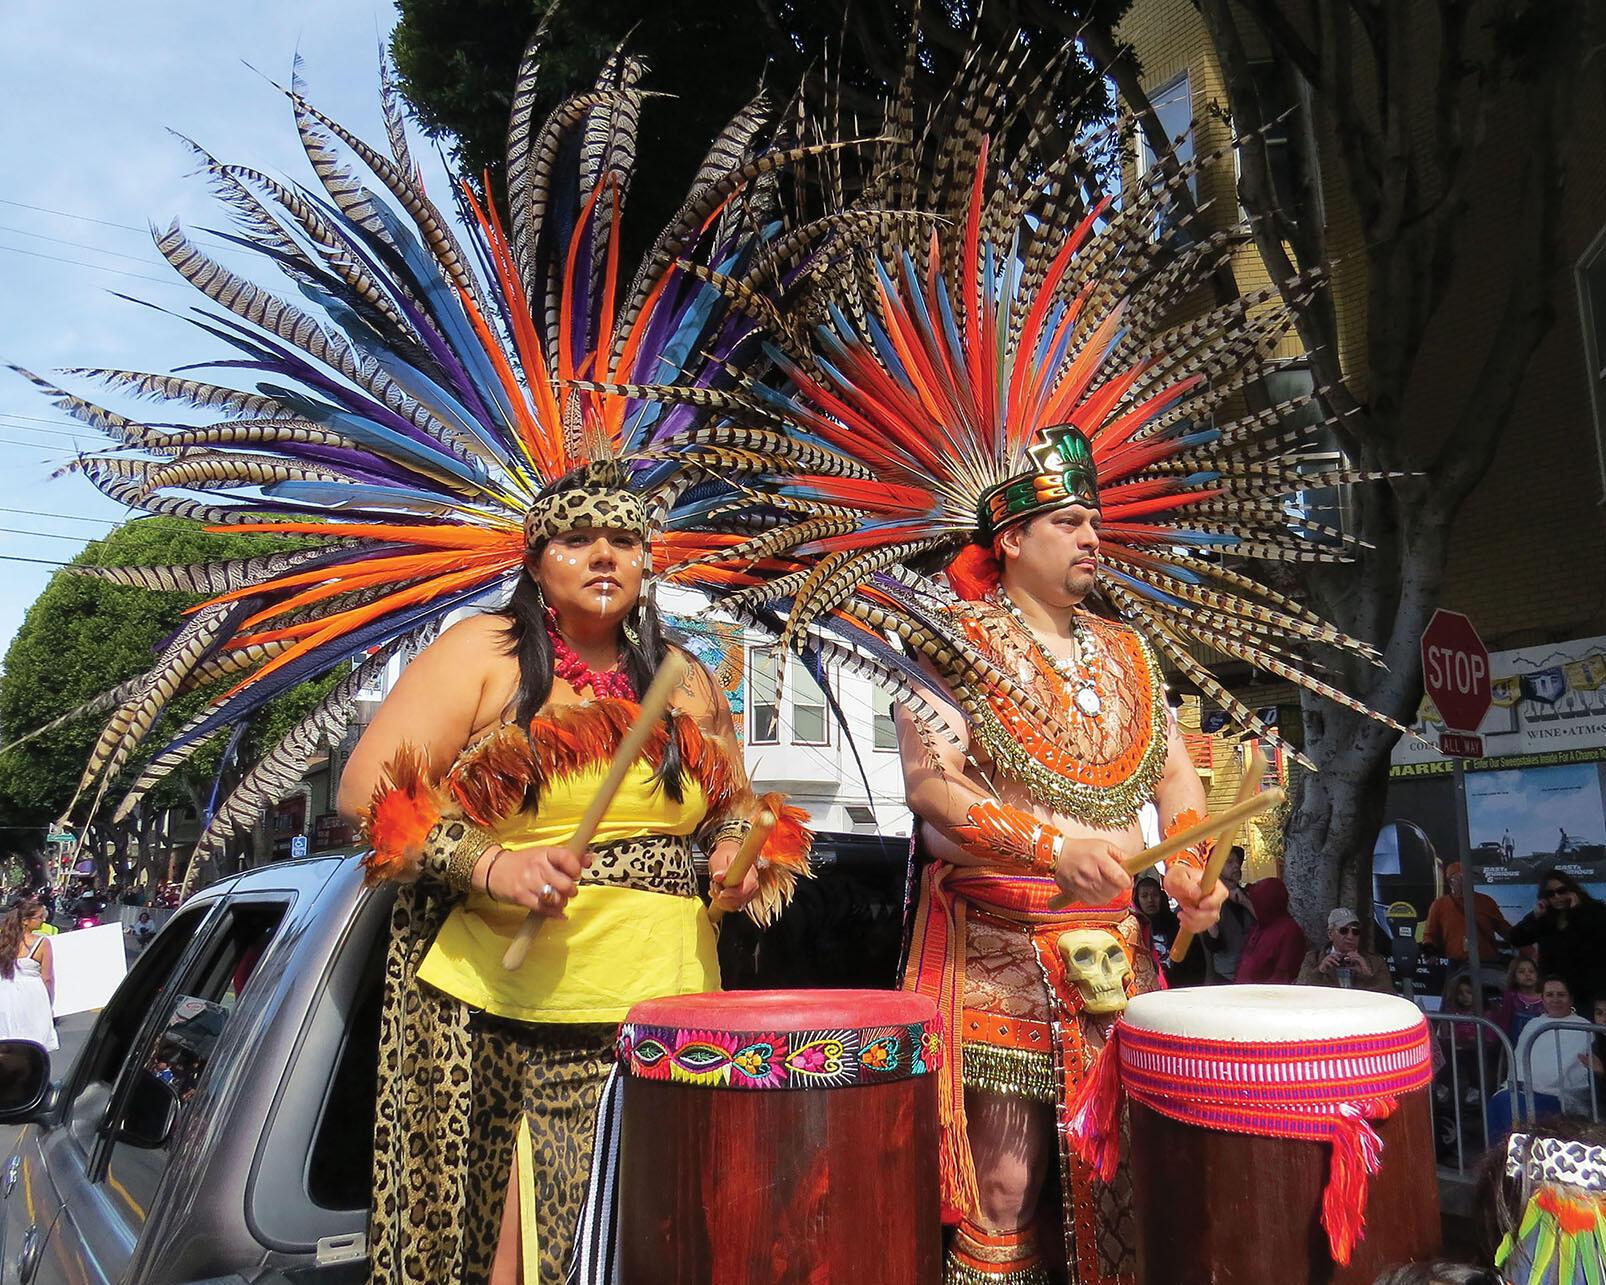 Members of Xiuhcoatl Danza Azteca in San Francisco at the annual Carnaval San Francisco. (Photo by Carnaval.com Studios.)